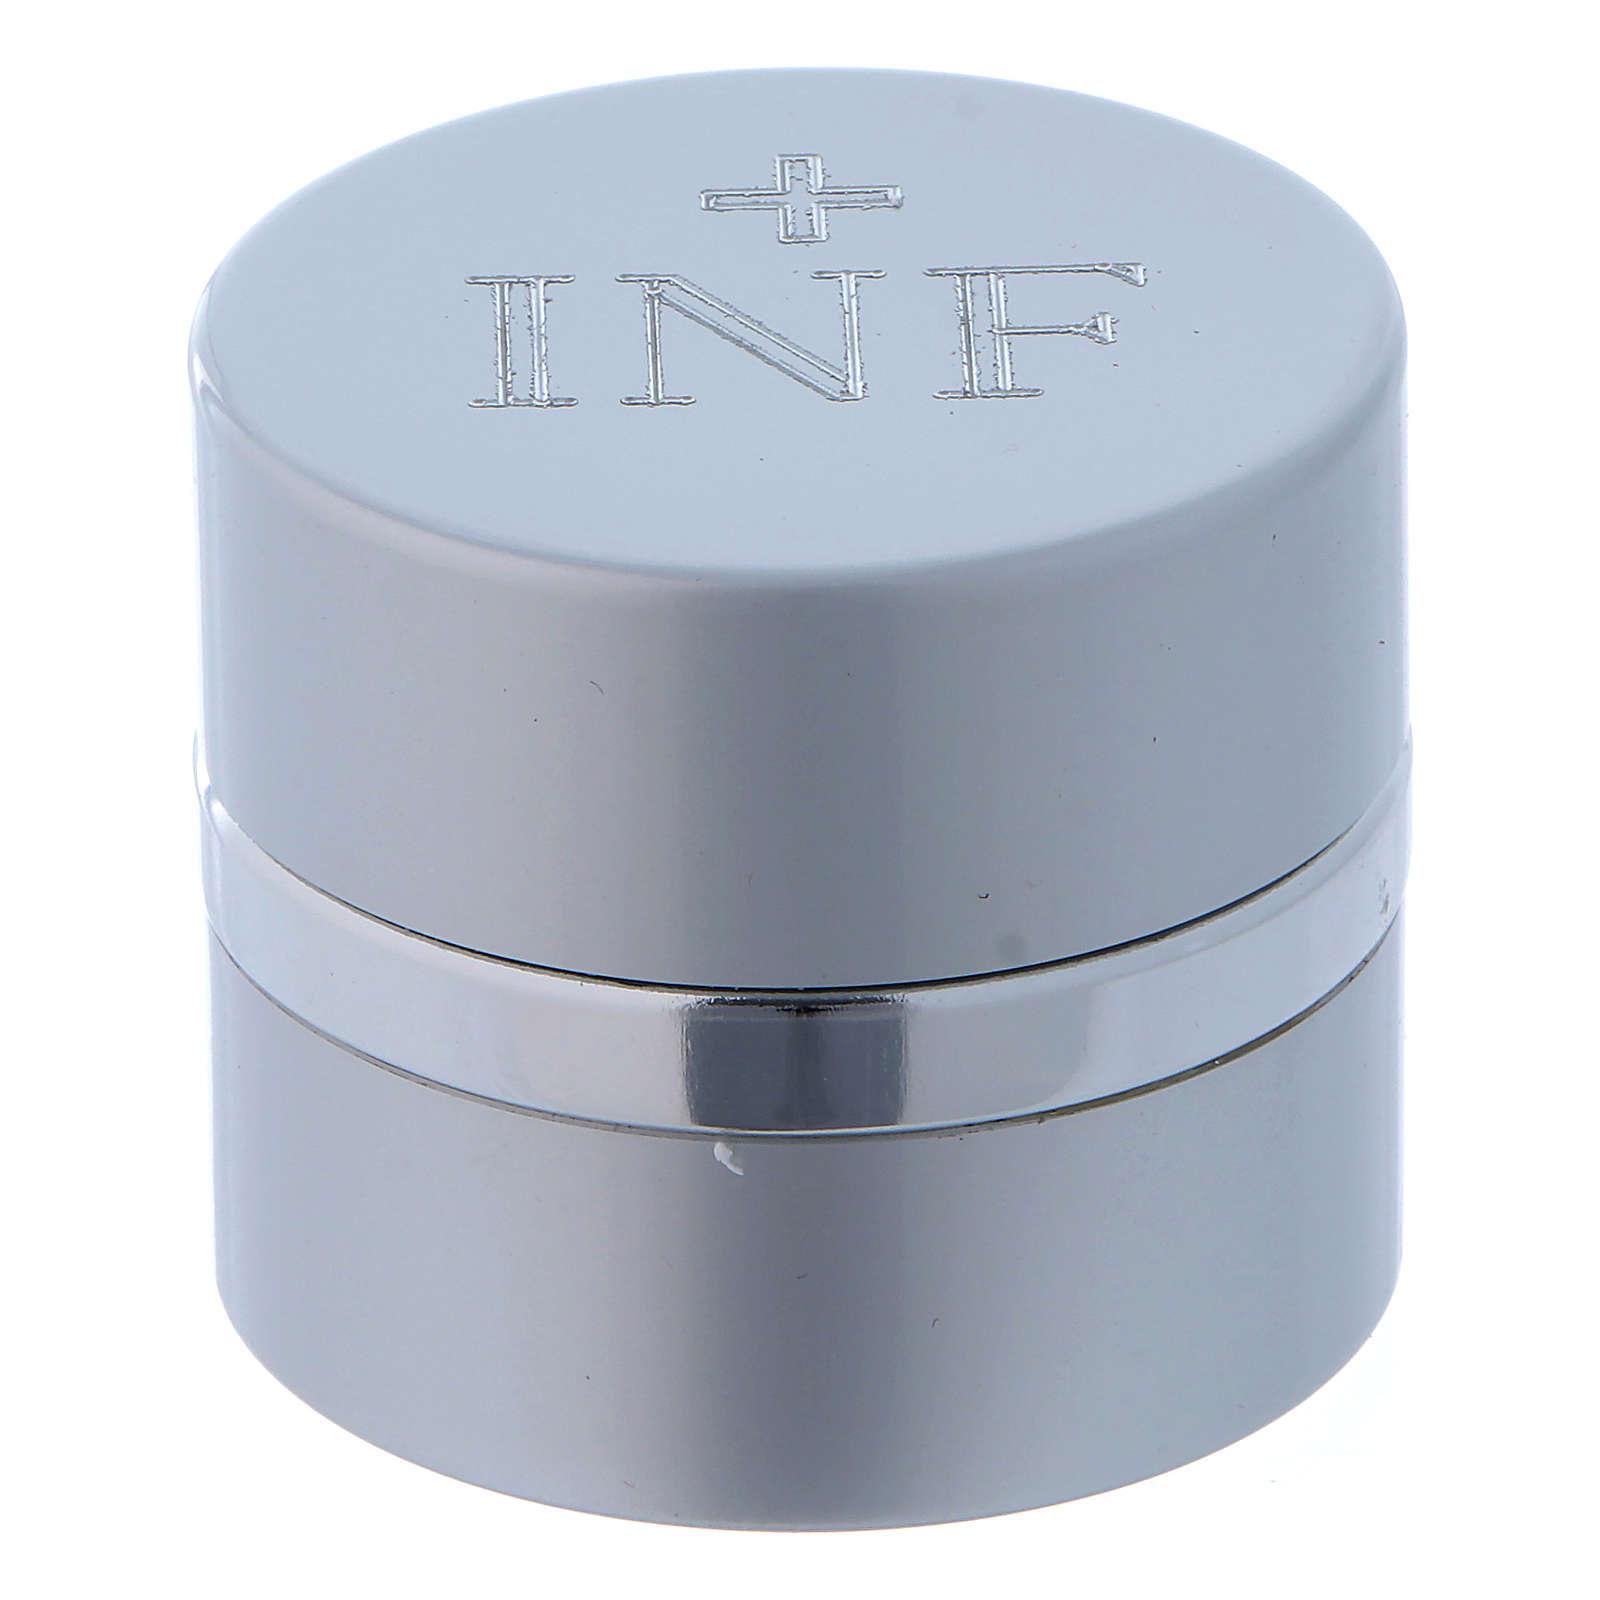 Frasco para Santos Óleos redondo aluminio color plata diámetro 4,3 cm 3